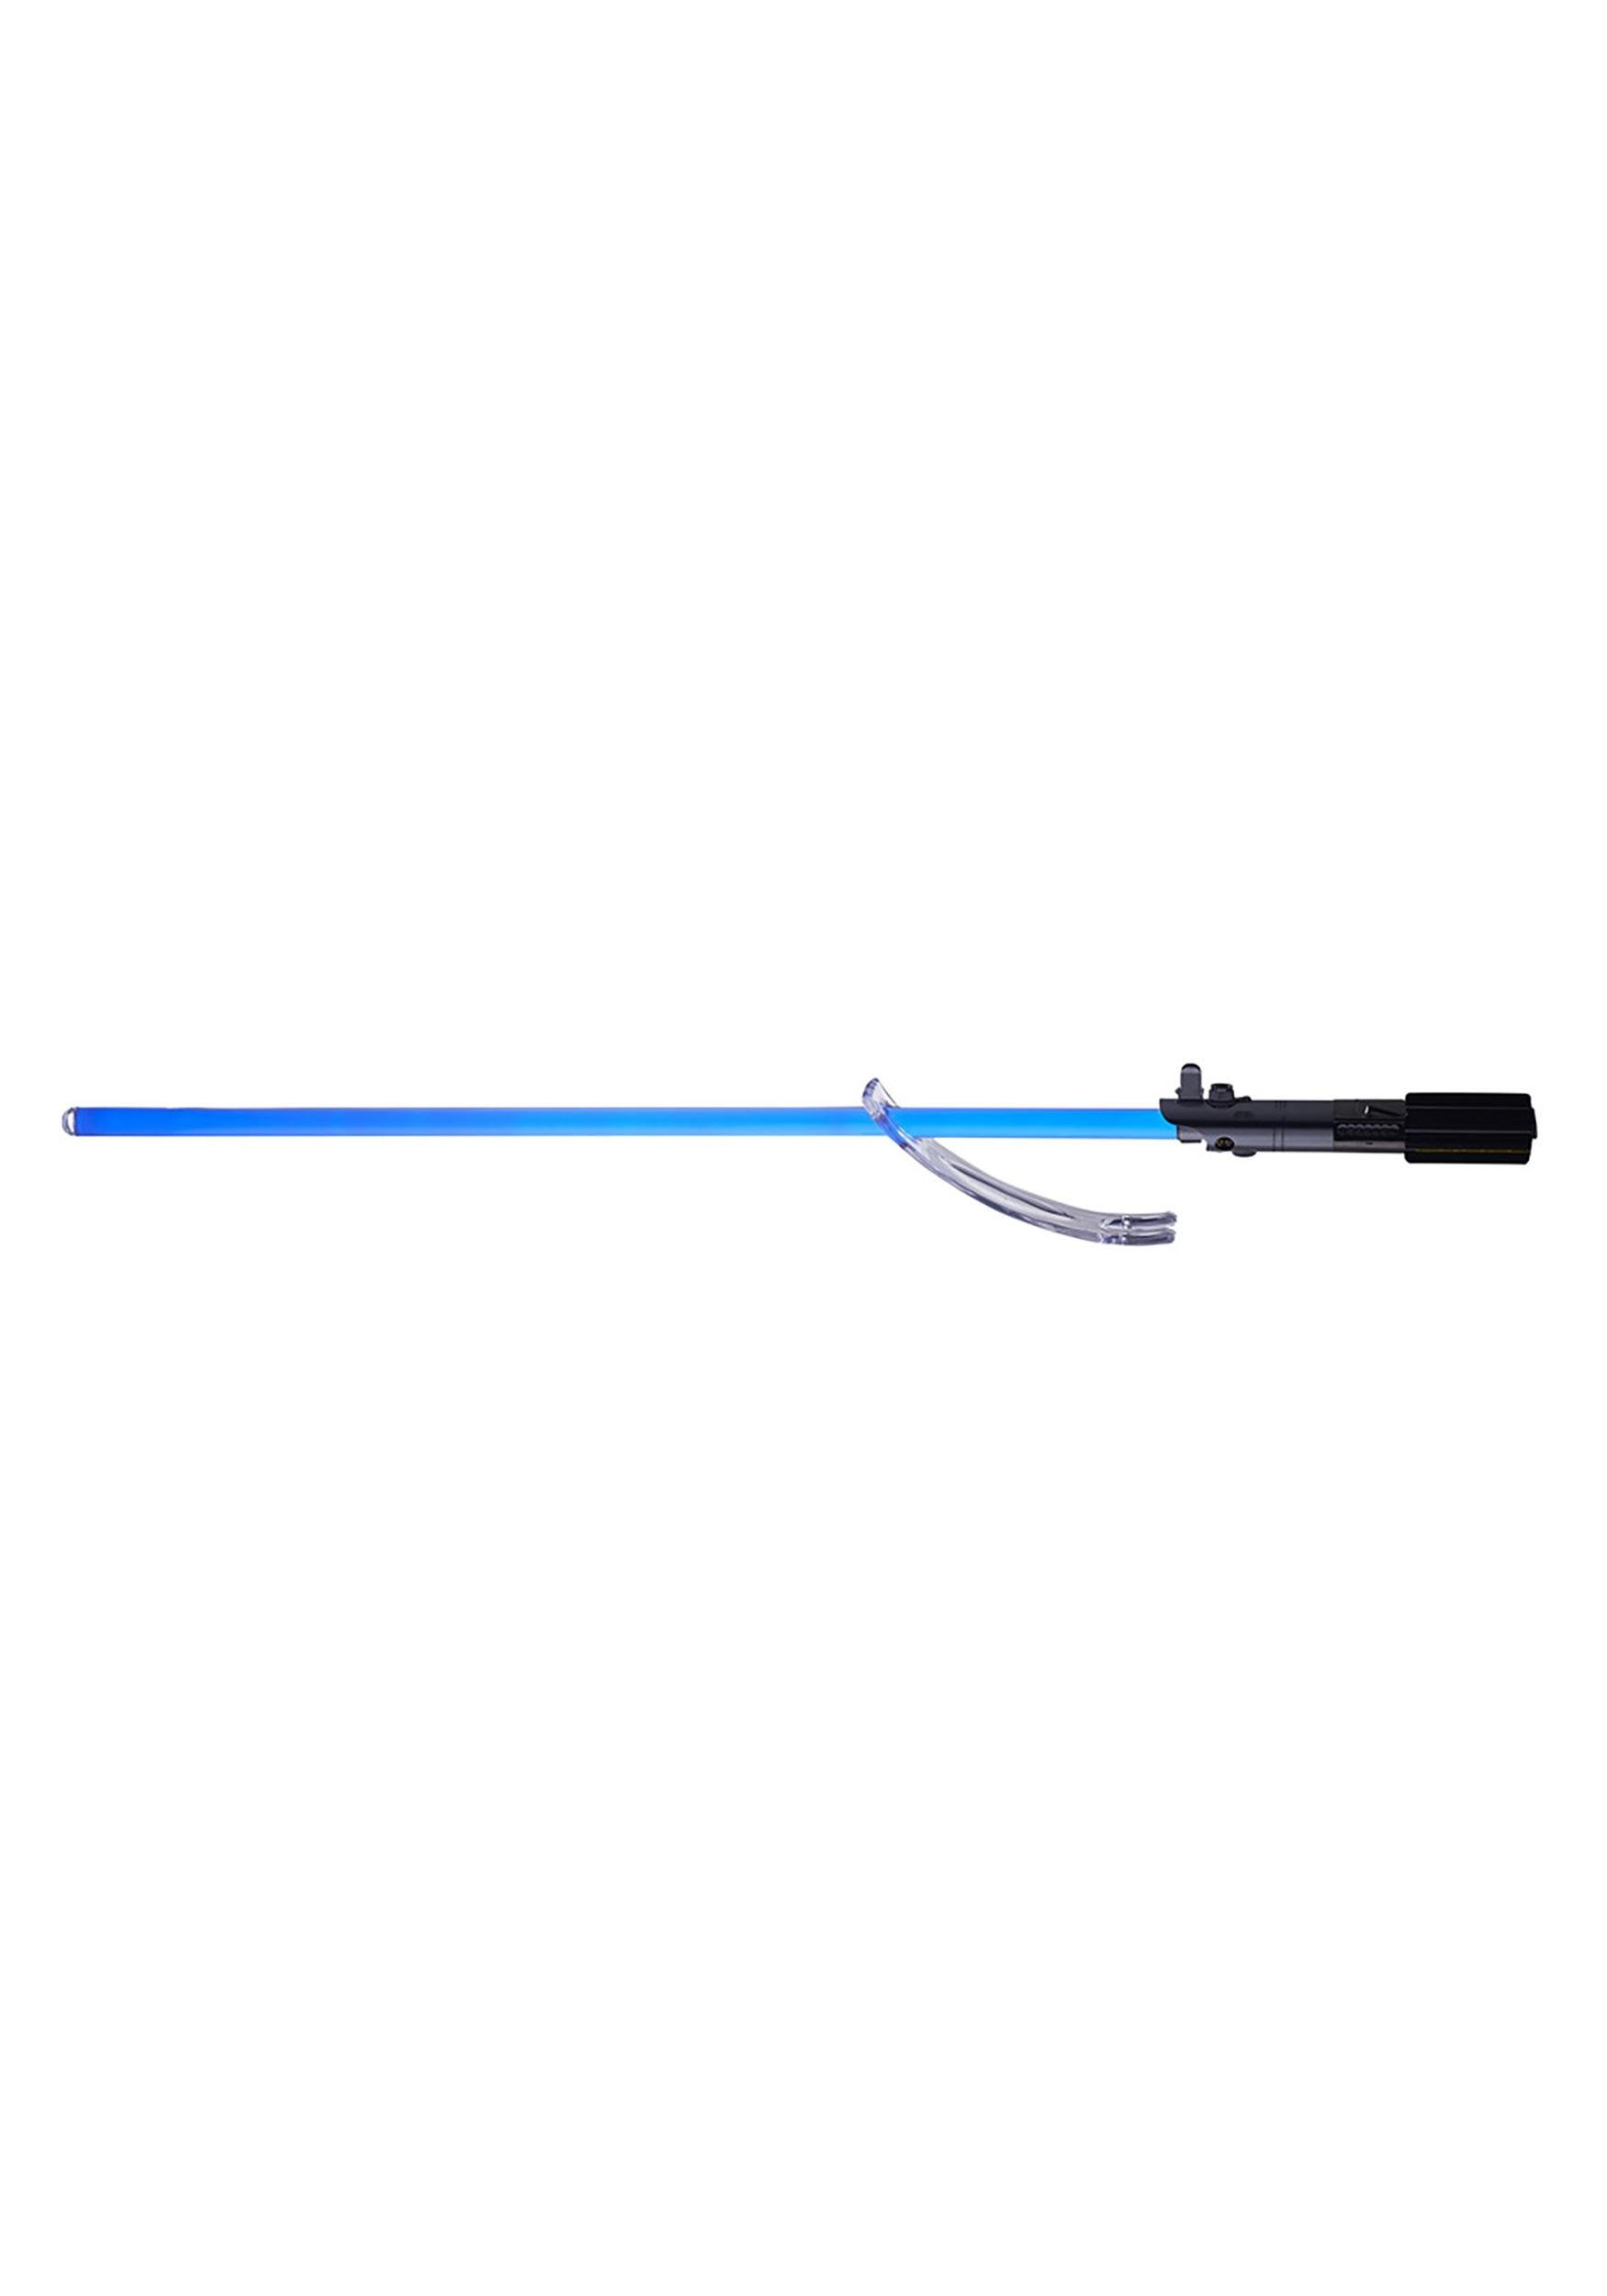 Star Wars Luke Skywalker Force FX Lightsaber EEDB3922AS00